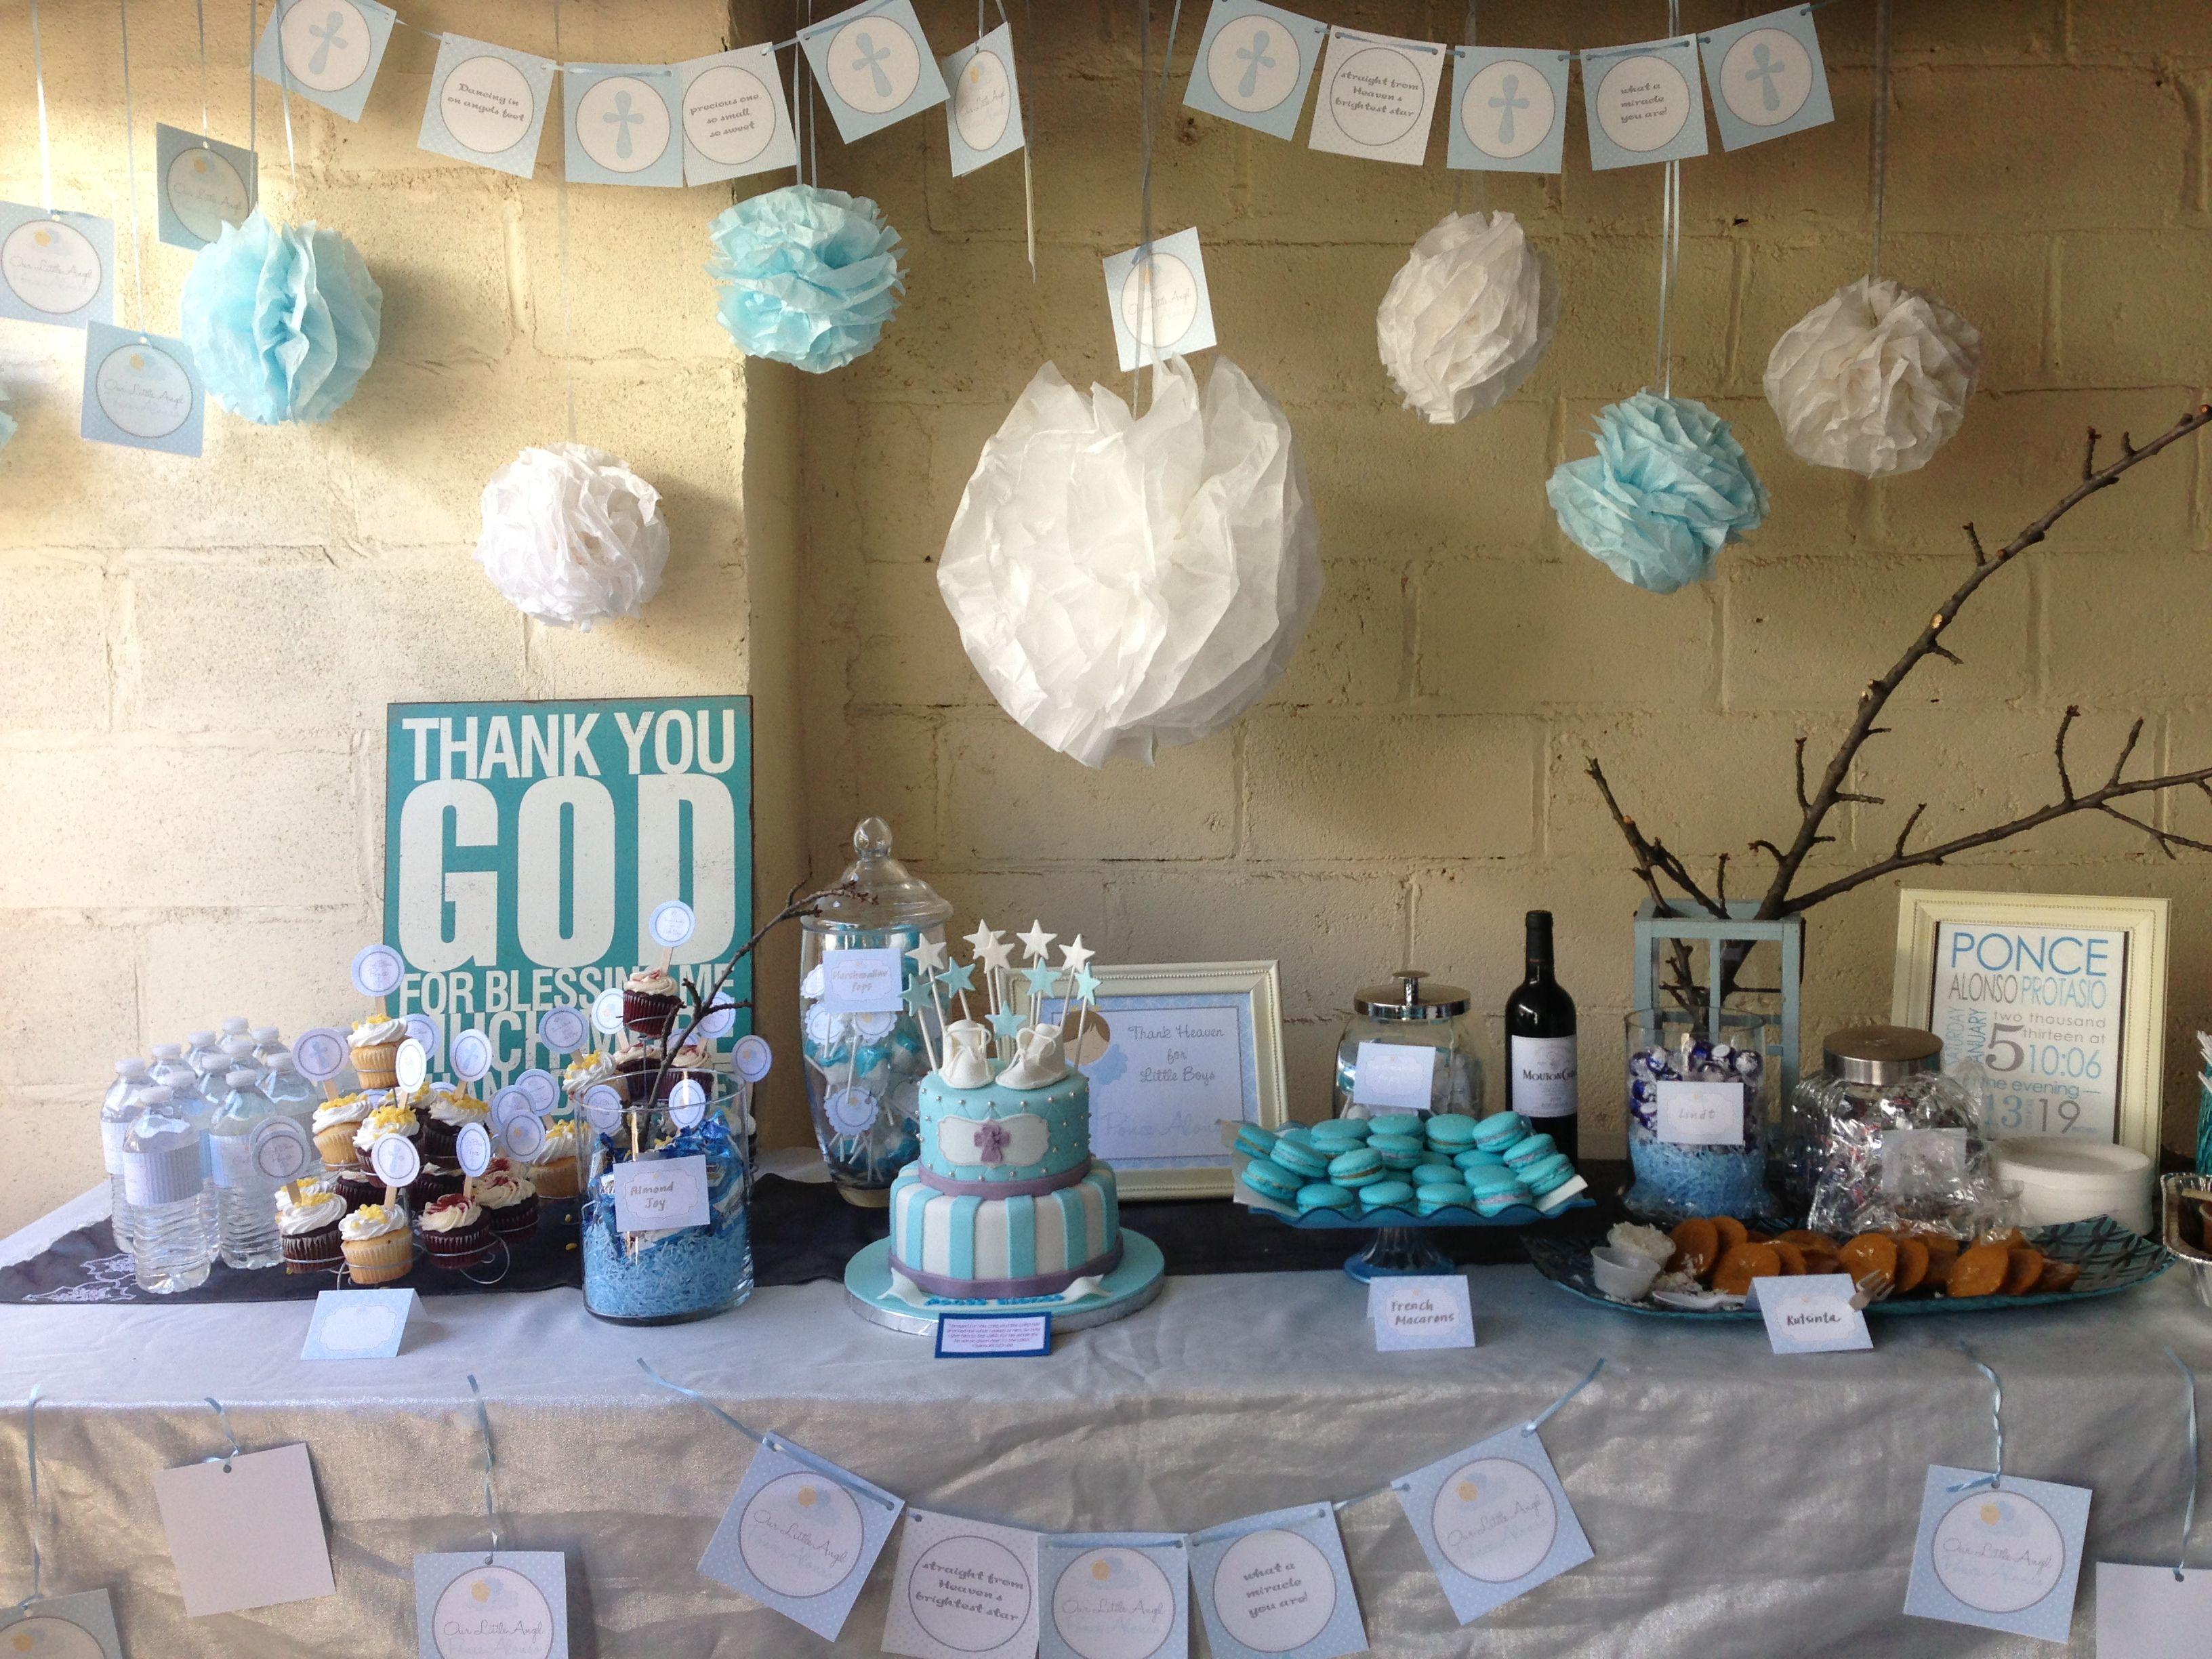 Ponce s baptismal rustic dessert table life